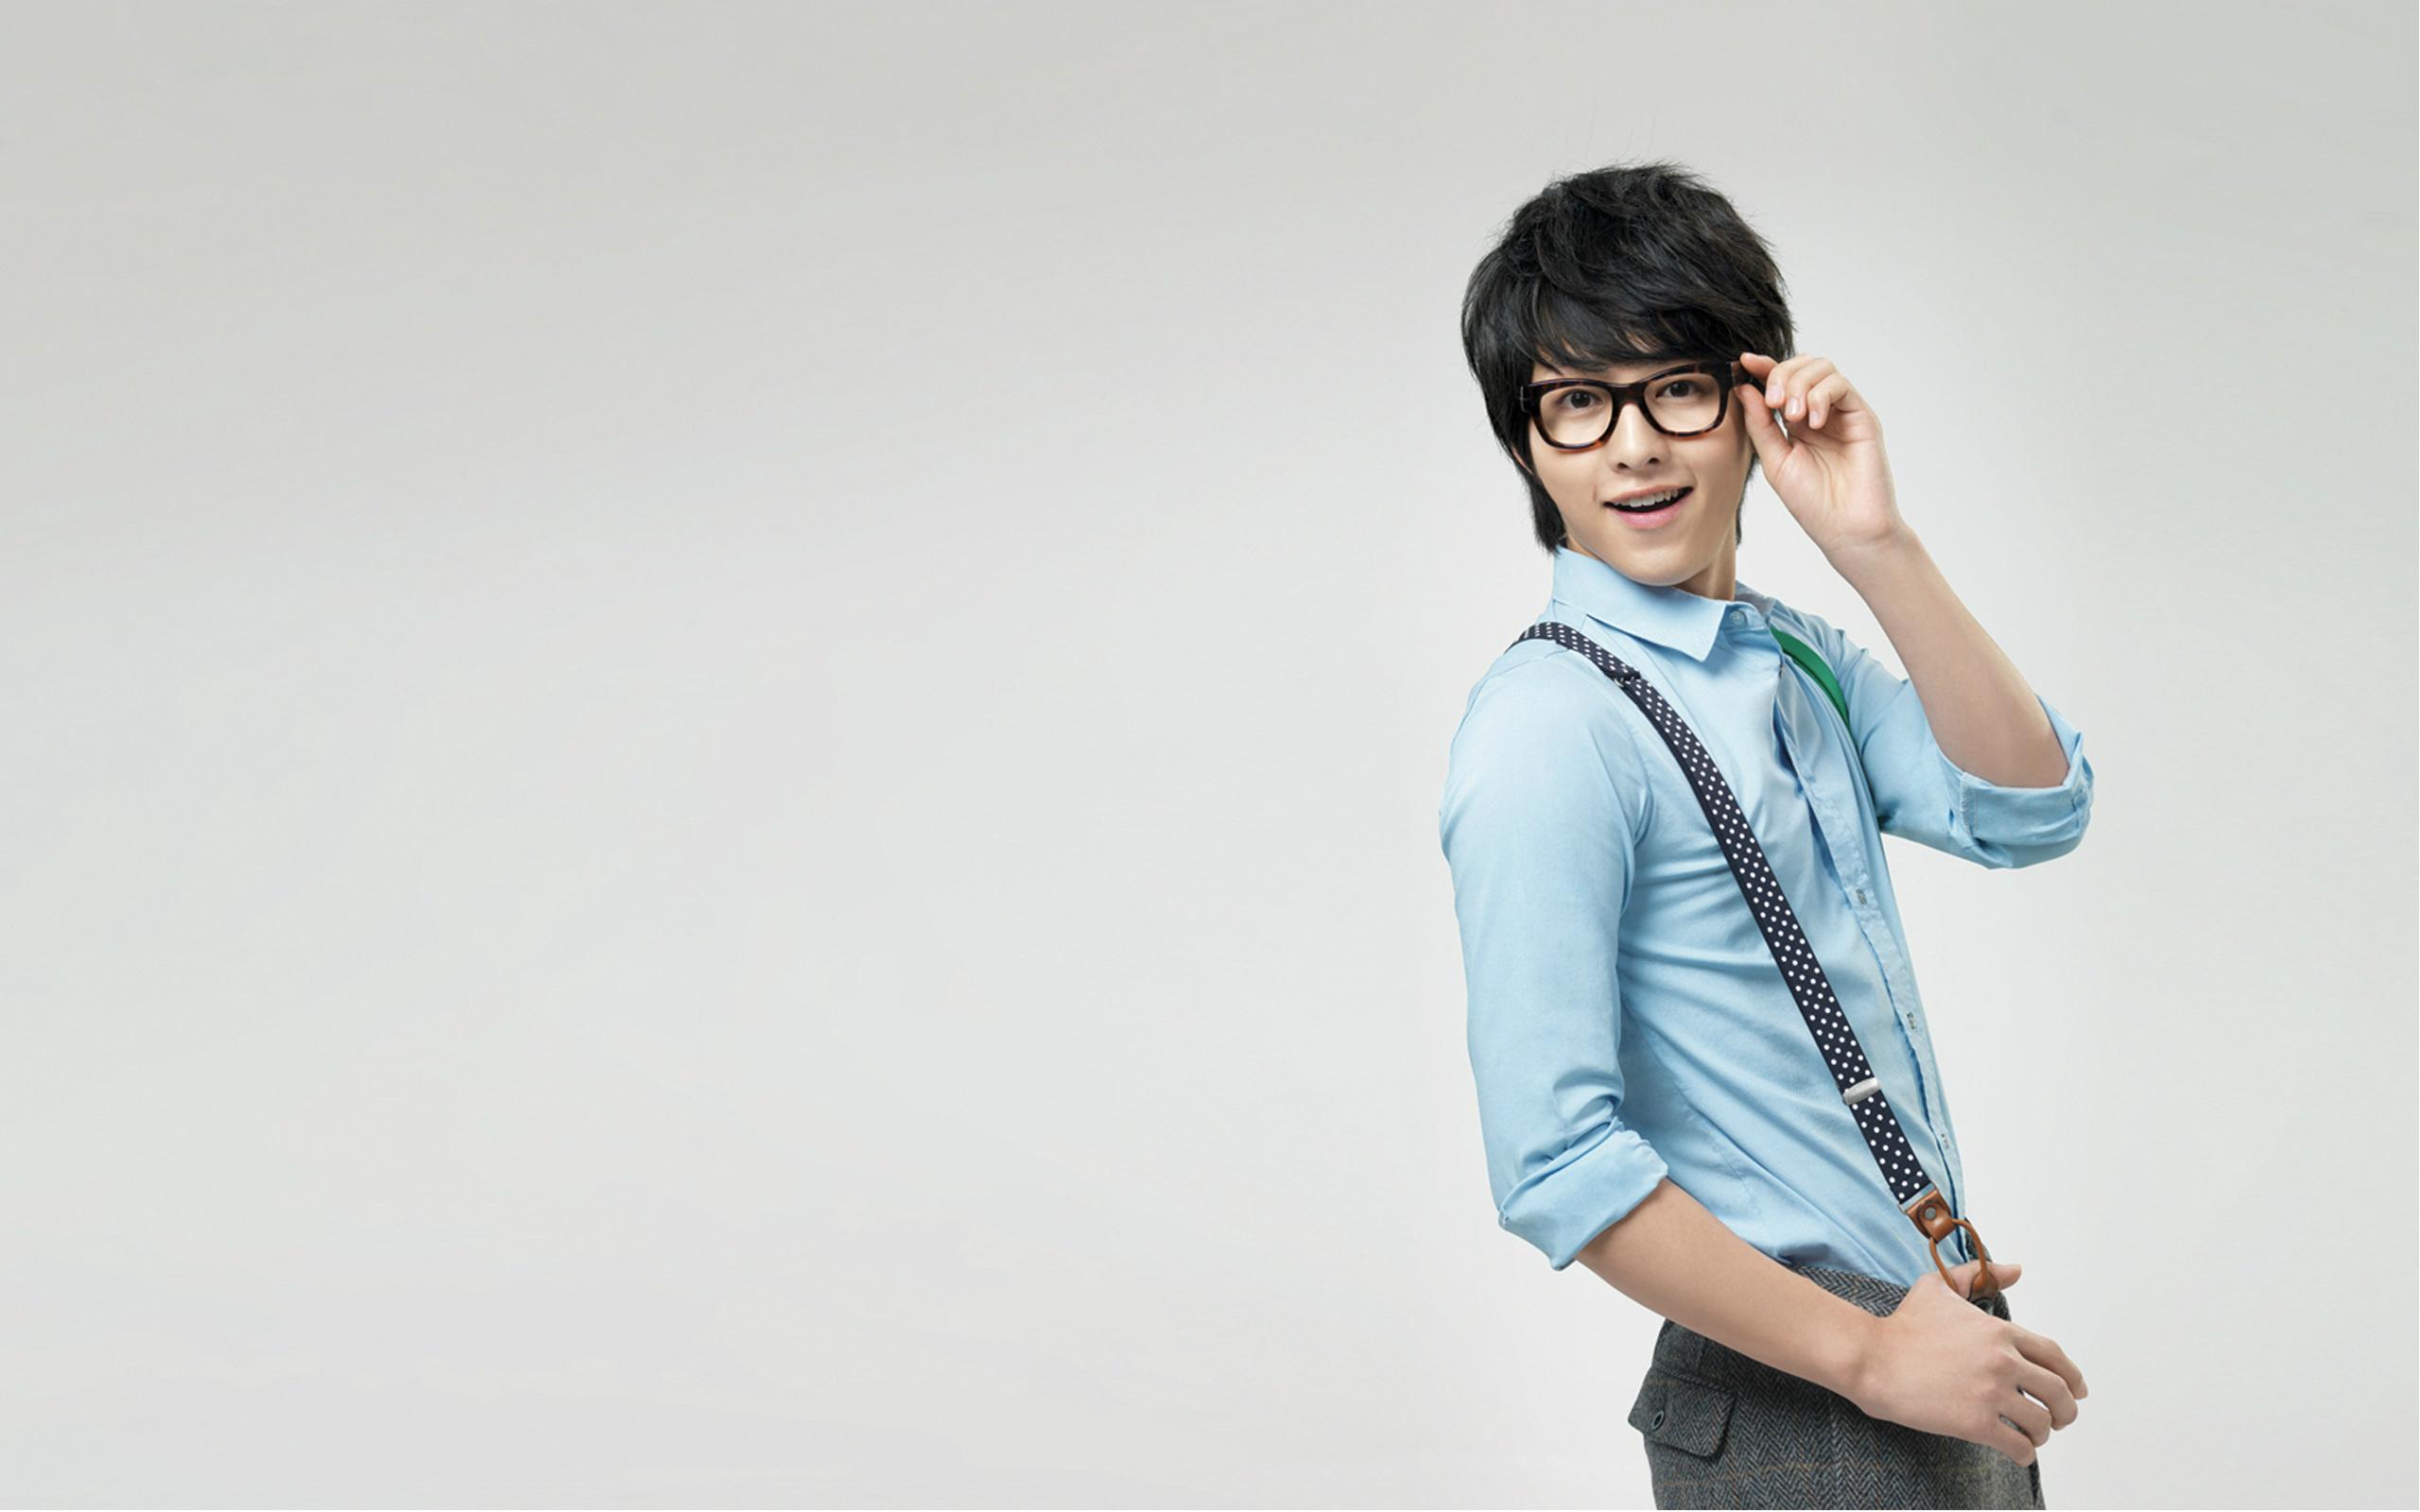 Song Joong Ki Hd Background